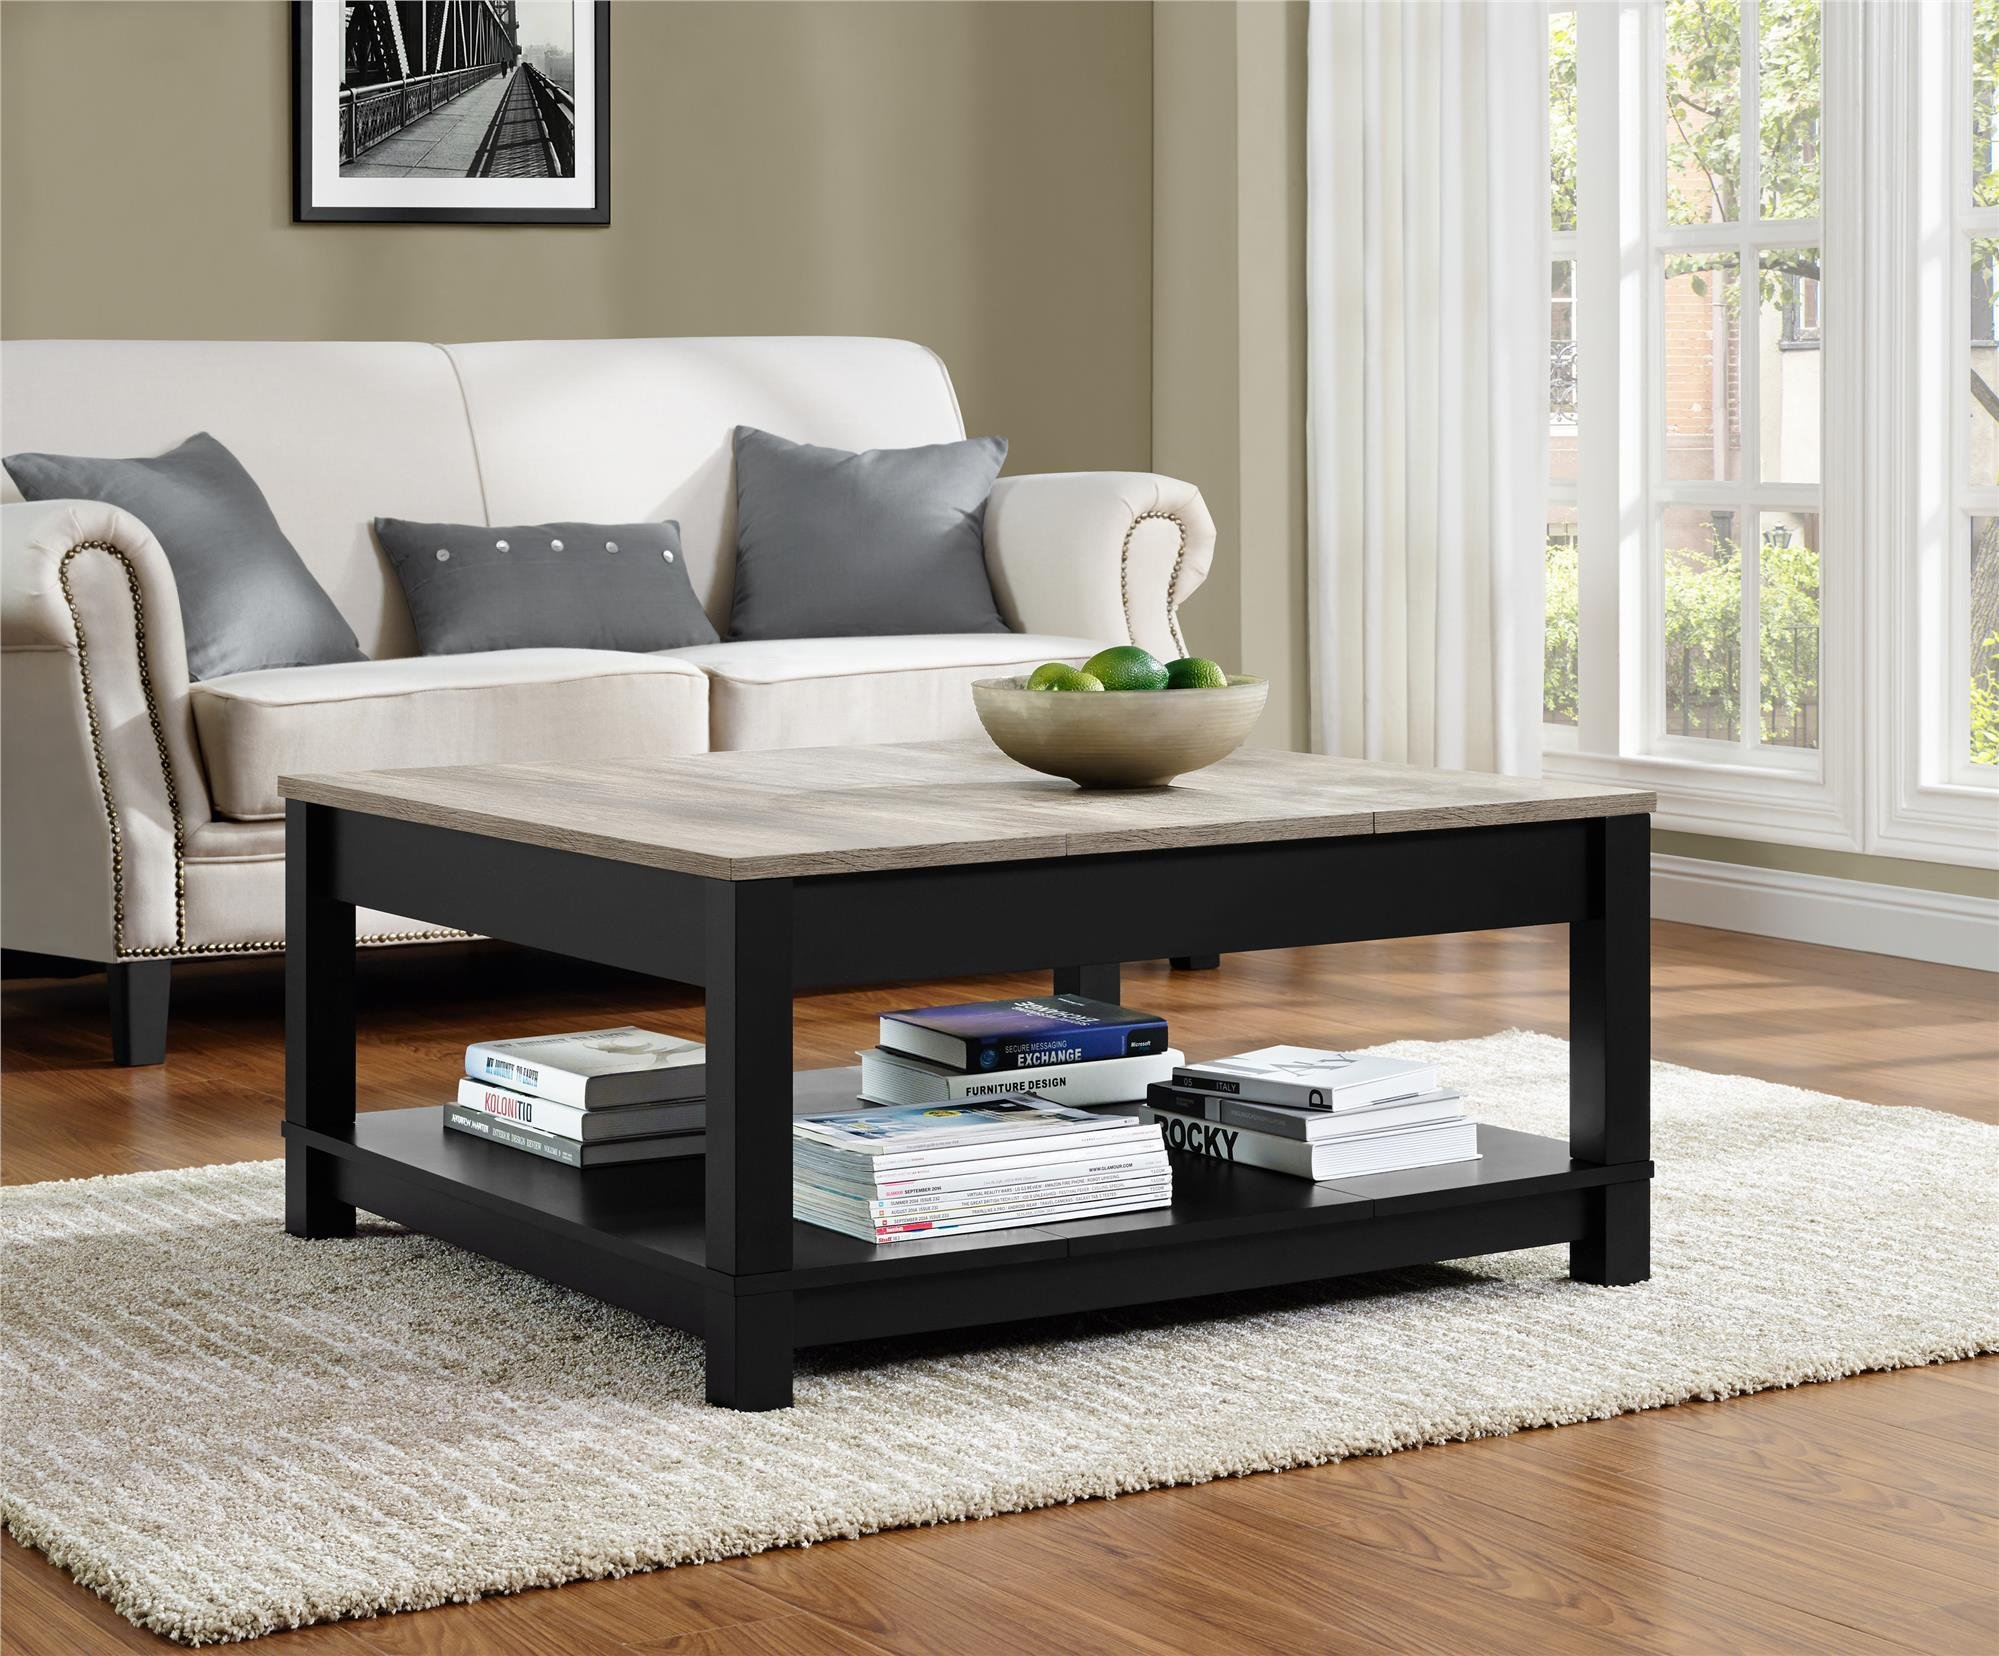 Ameriwood Home Carver Coffee Table, Black by Ameriwood Home